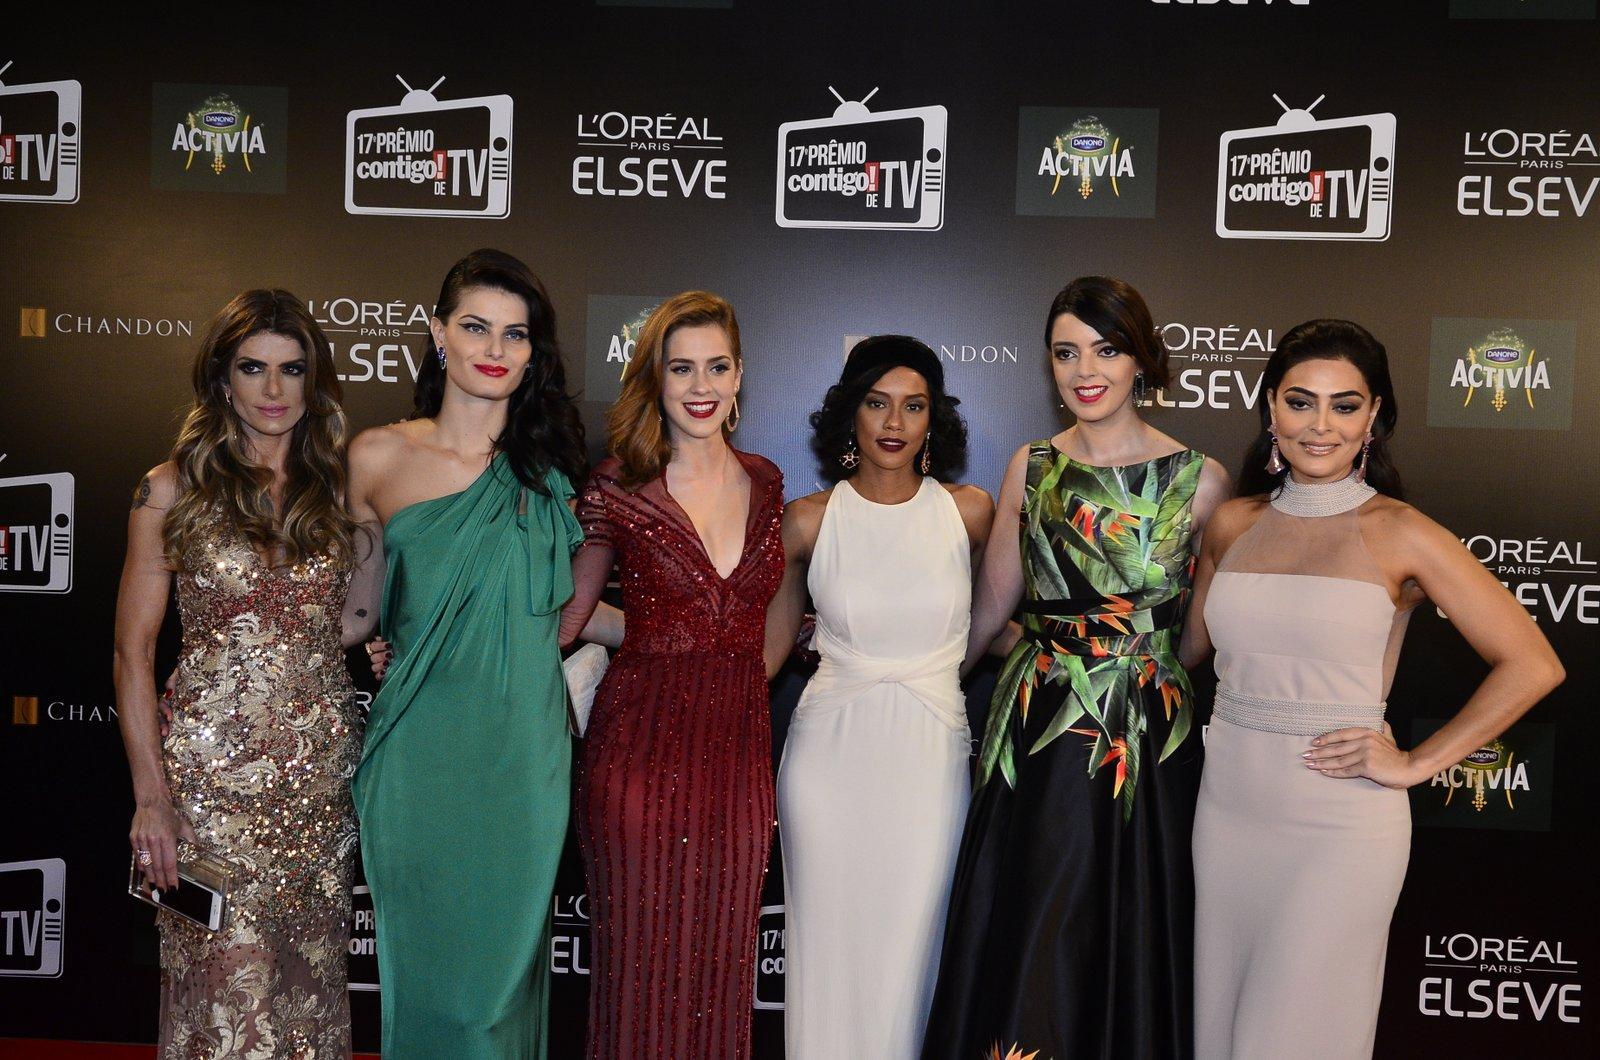 Carol Magalhães, Isabeli Fontana, Sophia Abrahão, Taís Araújo, Lia Camargo e Juliana Paes